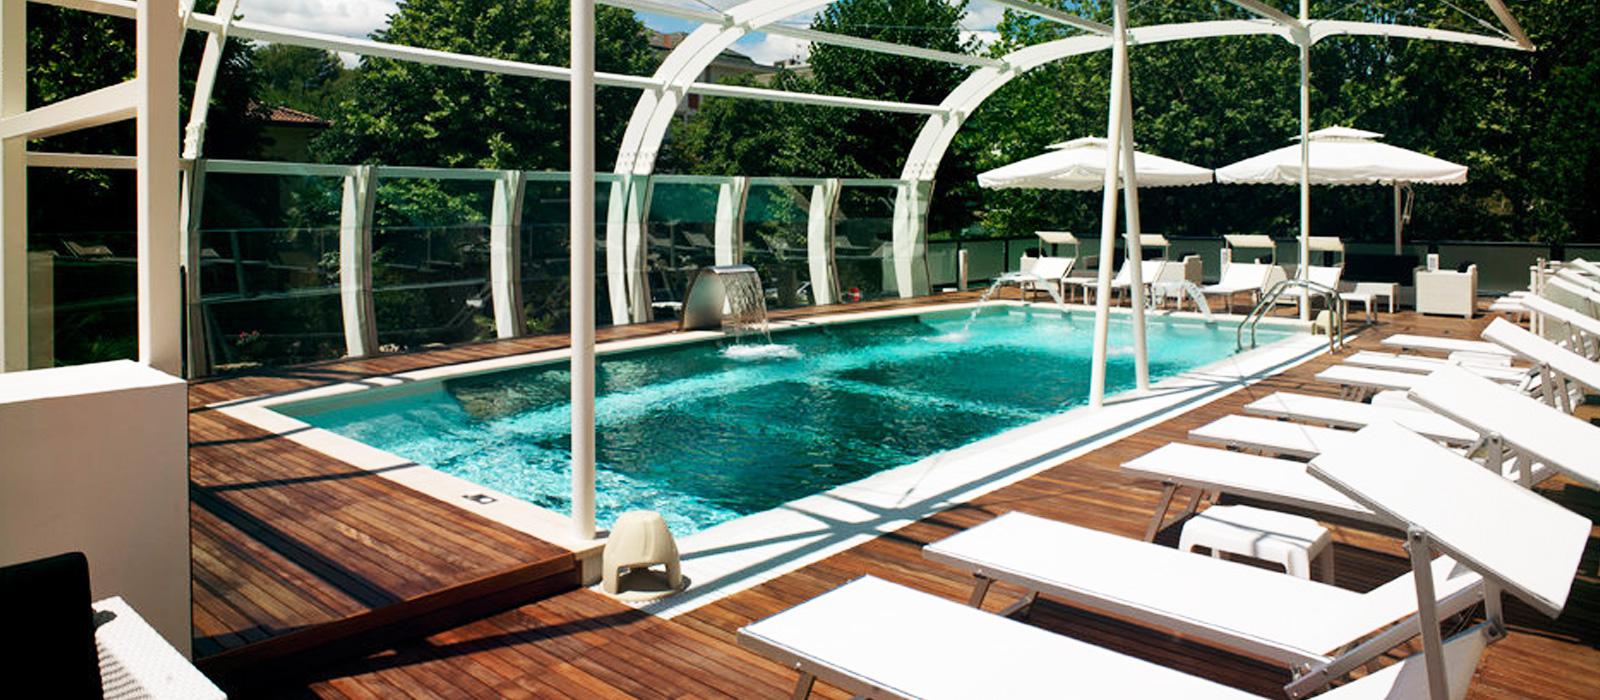 Hotel Boemia Riccione (hotelboemia.com)